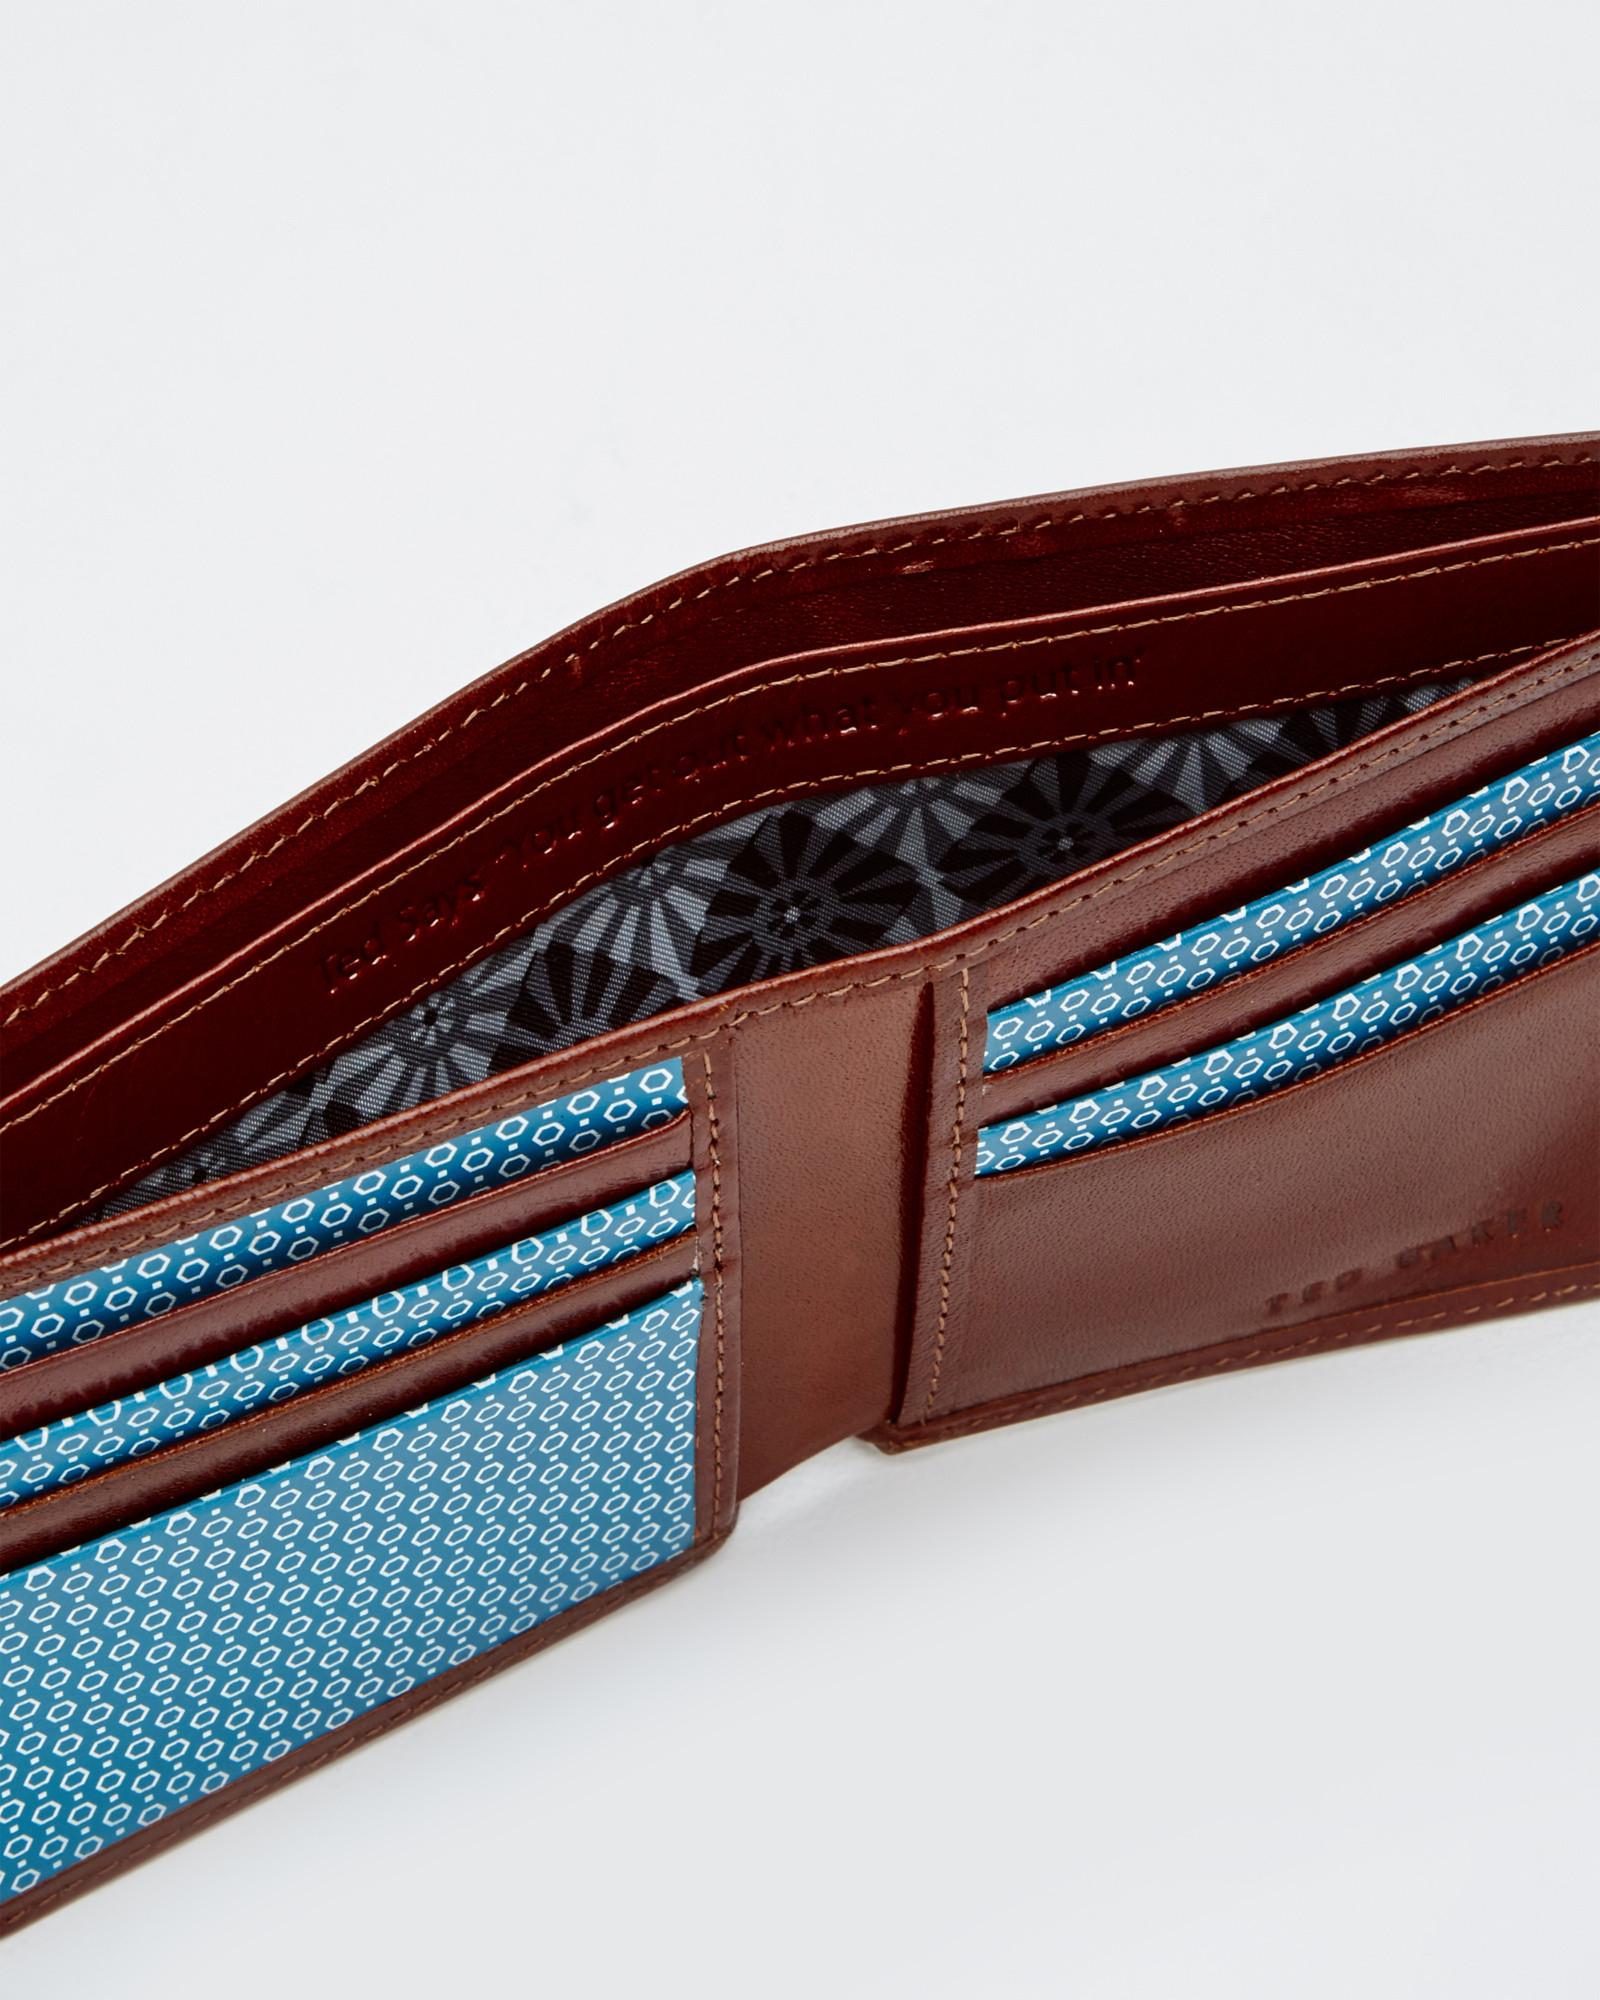 1eb1dba66 Lyst - Ted Baker Geo Print Leather Bi-fold Wallet in Brown for Men